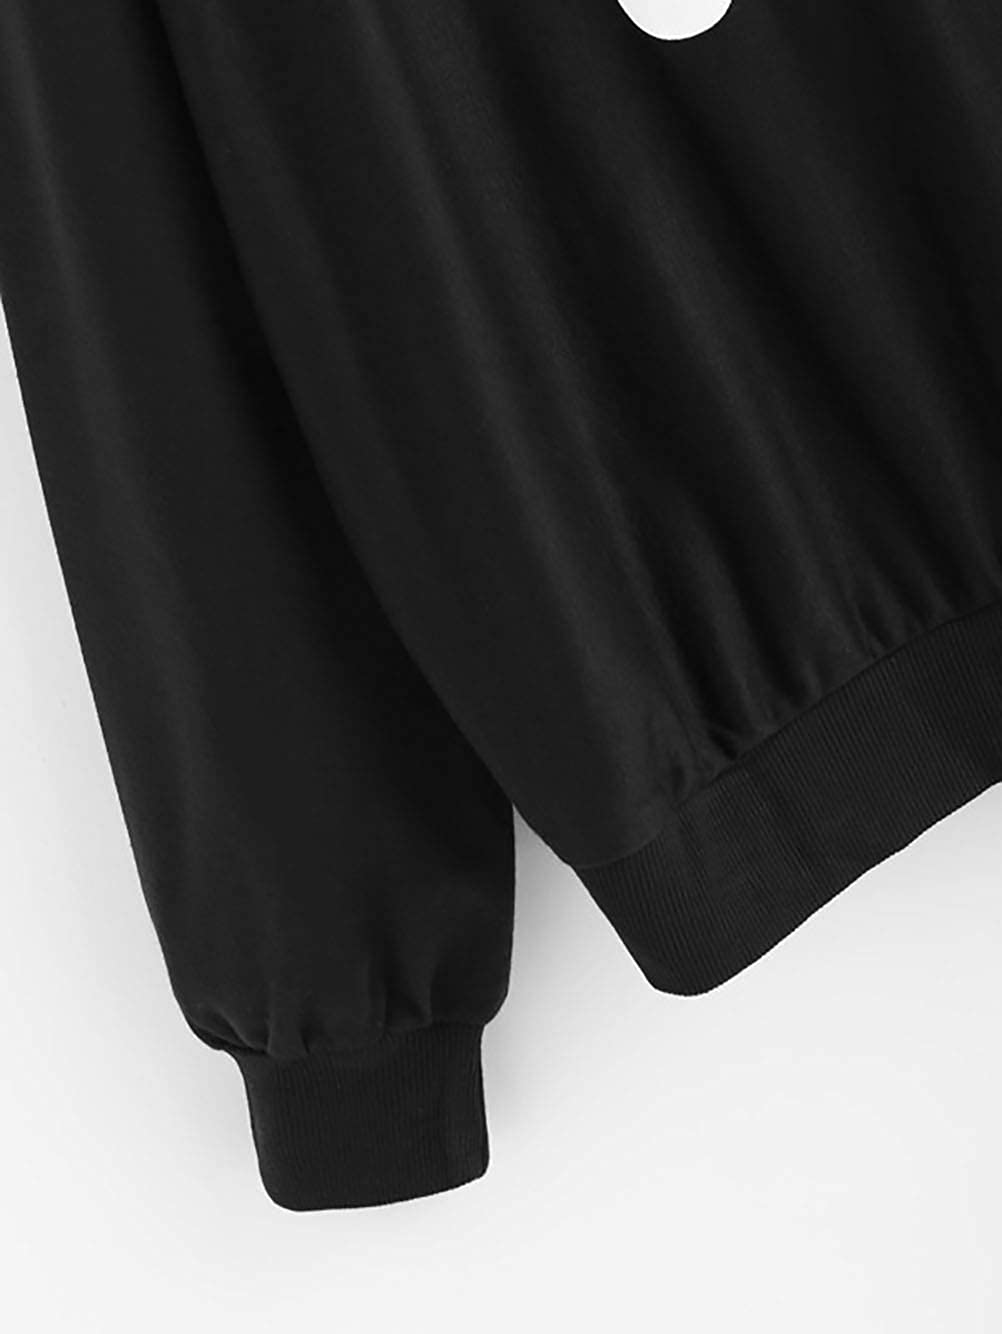 ADLISA Im So Freaking Cold Womens Hoodie Long Sleeve Letter Print Loose Sweat Shirt Blouse